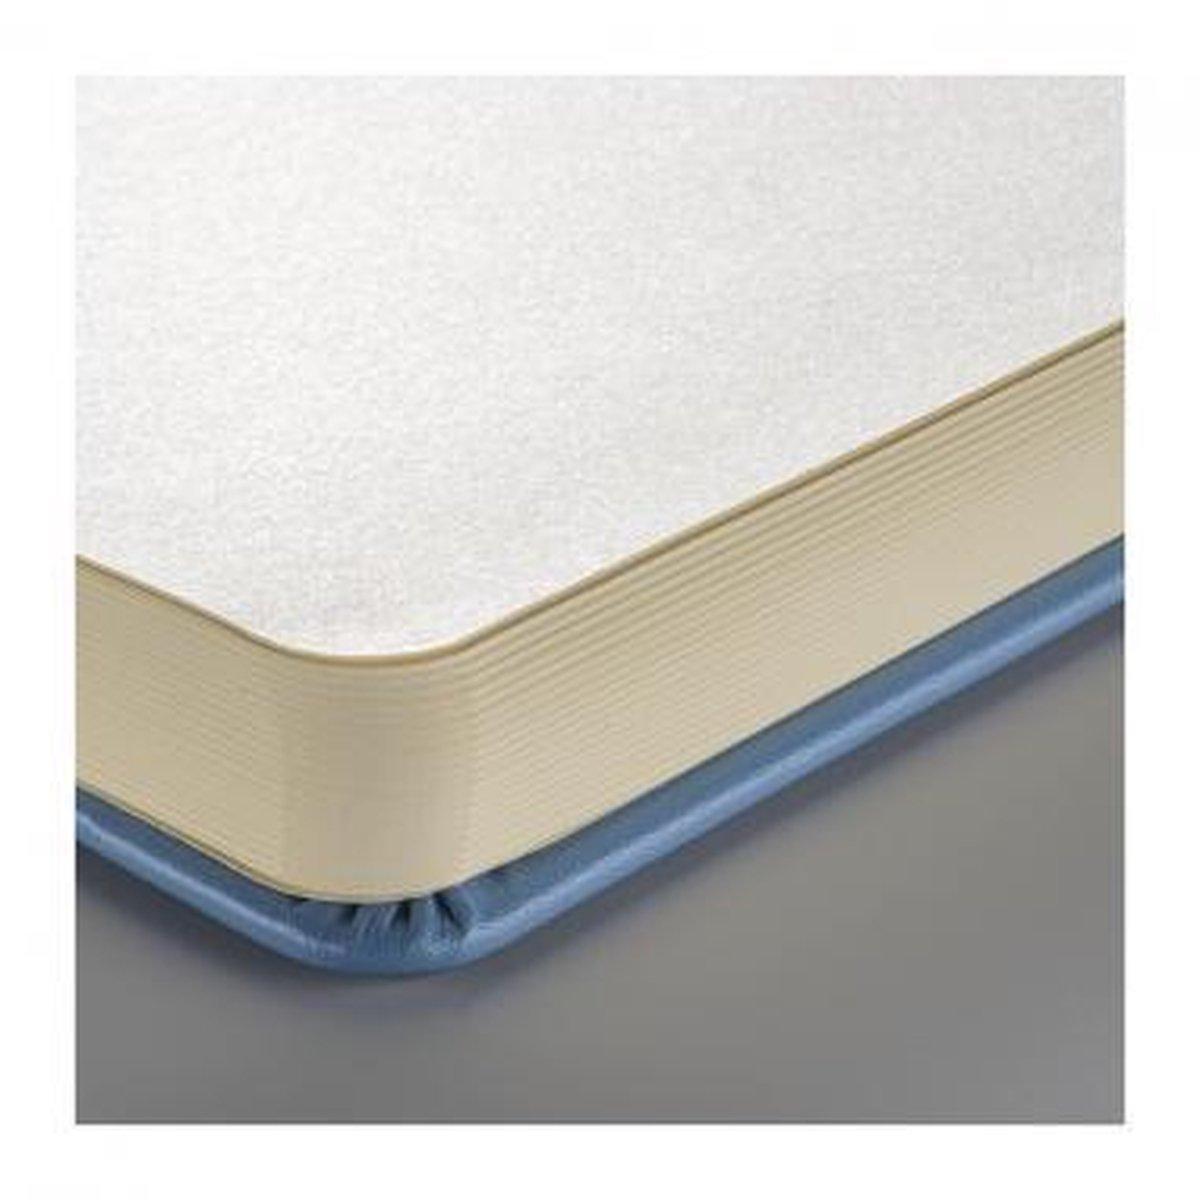 9314211m,Talens art creation schetsboek 9x14cm 140grams 80 vel lake blue